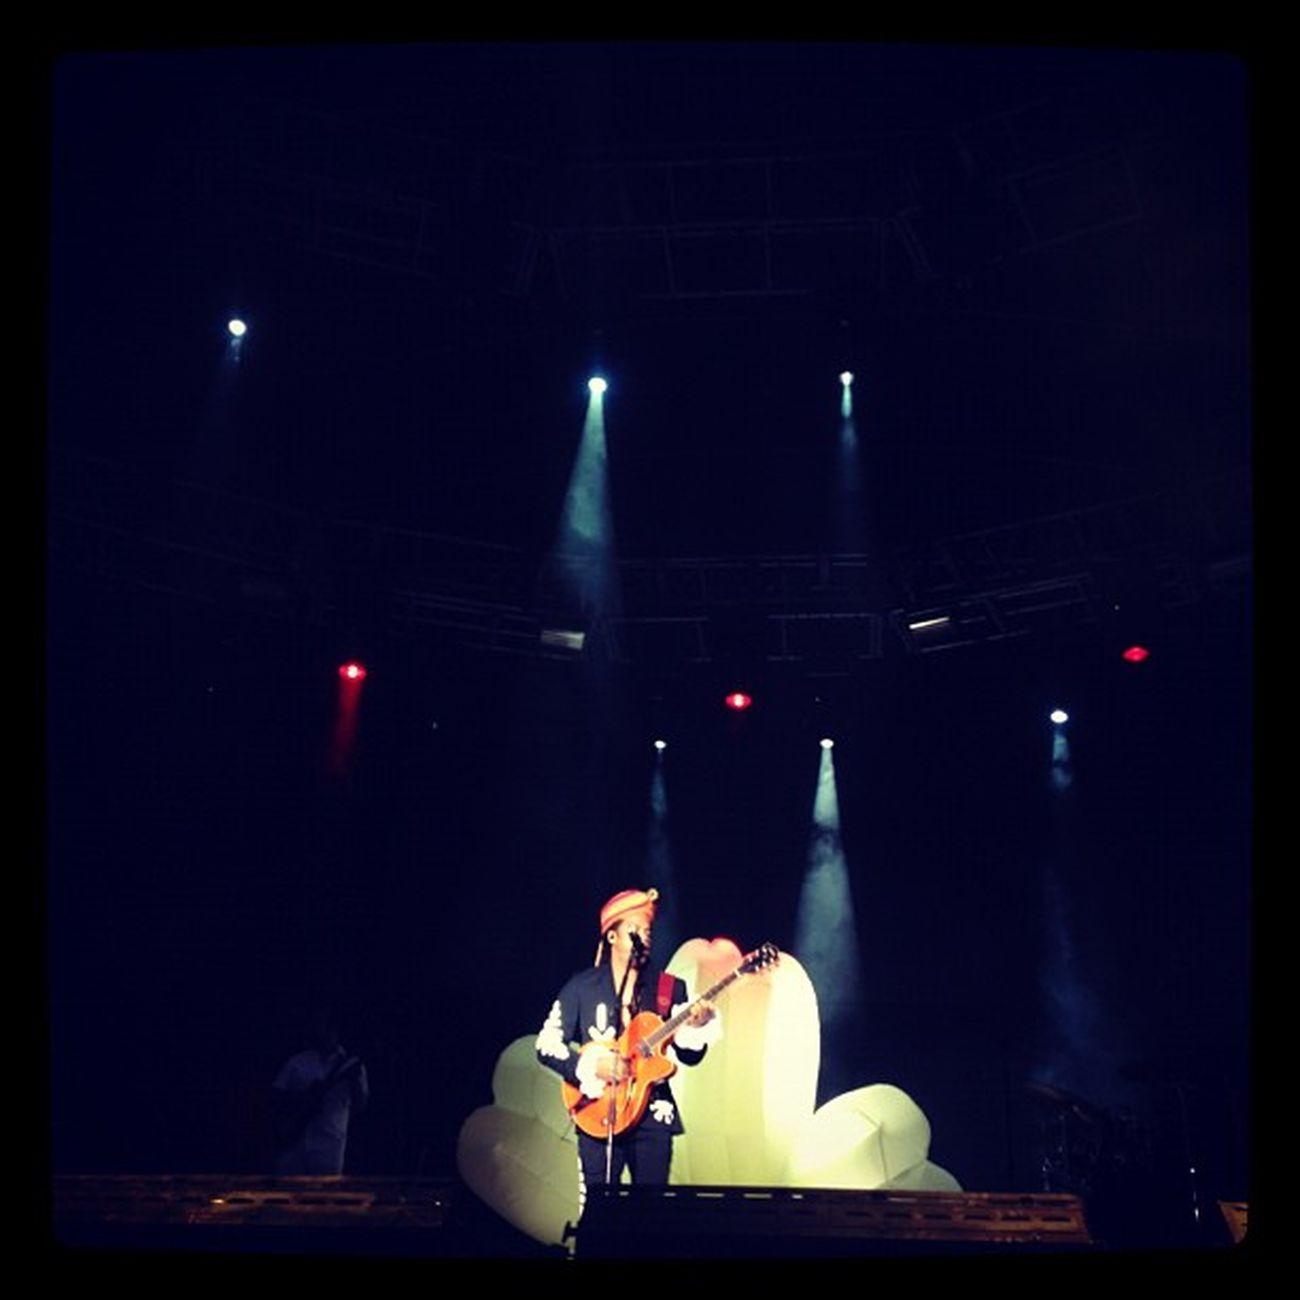 #carlinhosbrown en vivo en #movistarfreemusic via #popckorn #nokian8 Coolturabsas TBT  Nokian8 Instamood Movistarfreemusic Buenosaires Carlinhosbrown FotoDelDia Igers IGDaily Instagood IPhone Instagramhub Argentina Webstagram Iphoneonly Tweetgram Photooftheday Mobilephoto Instagram Iphonegraphy Picoftheday Bsasmobilephoto Popckorn Followback Culturabaires